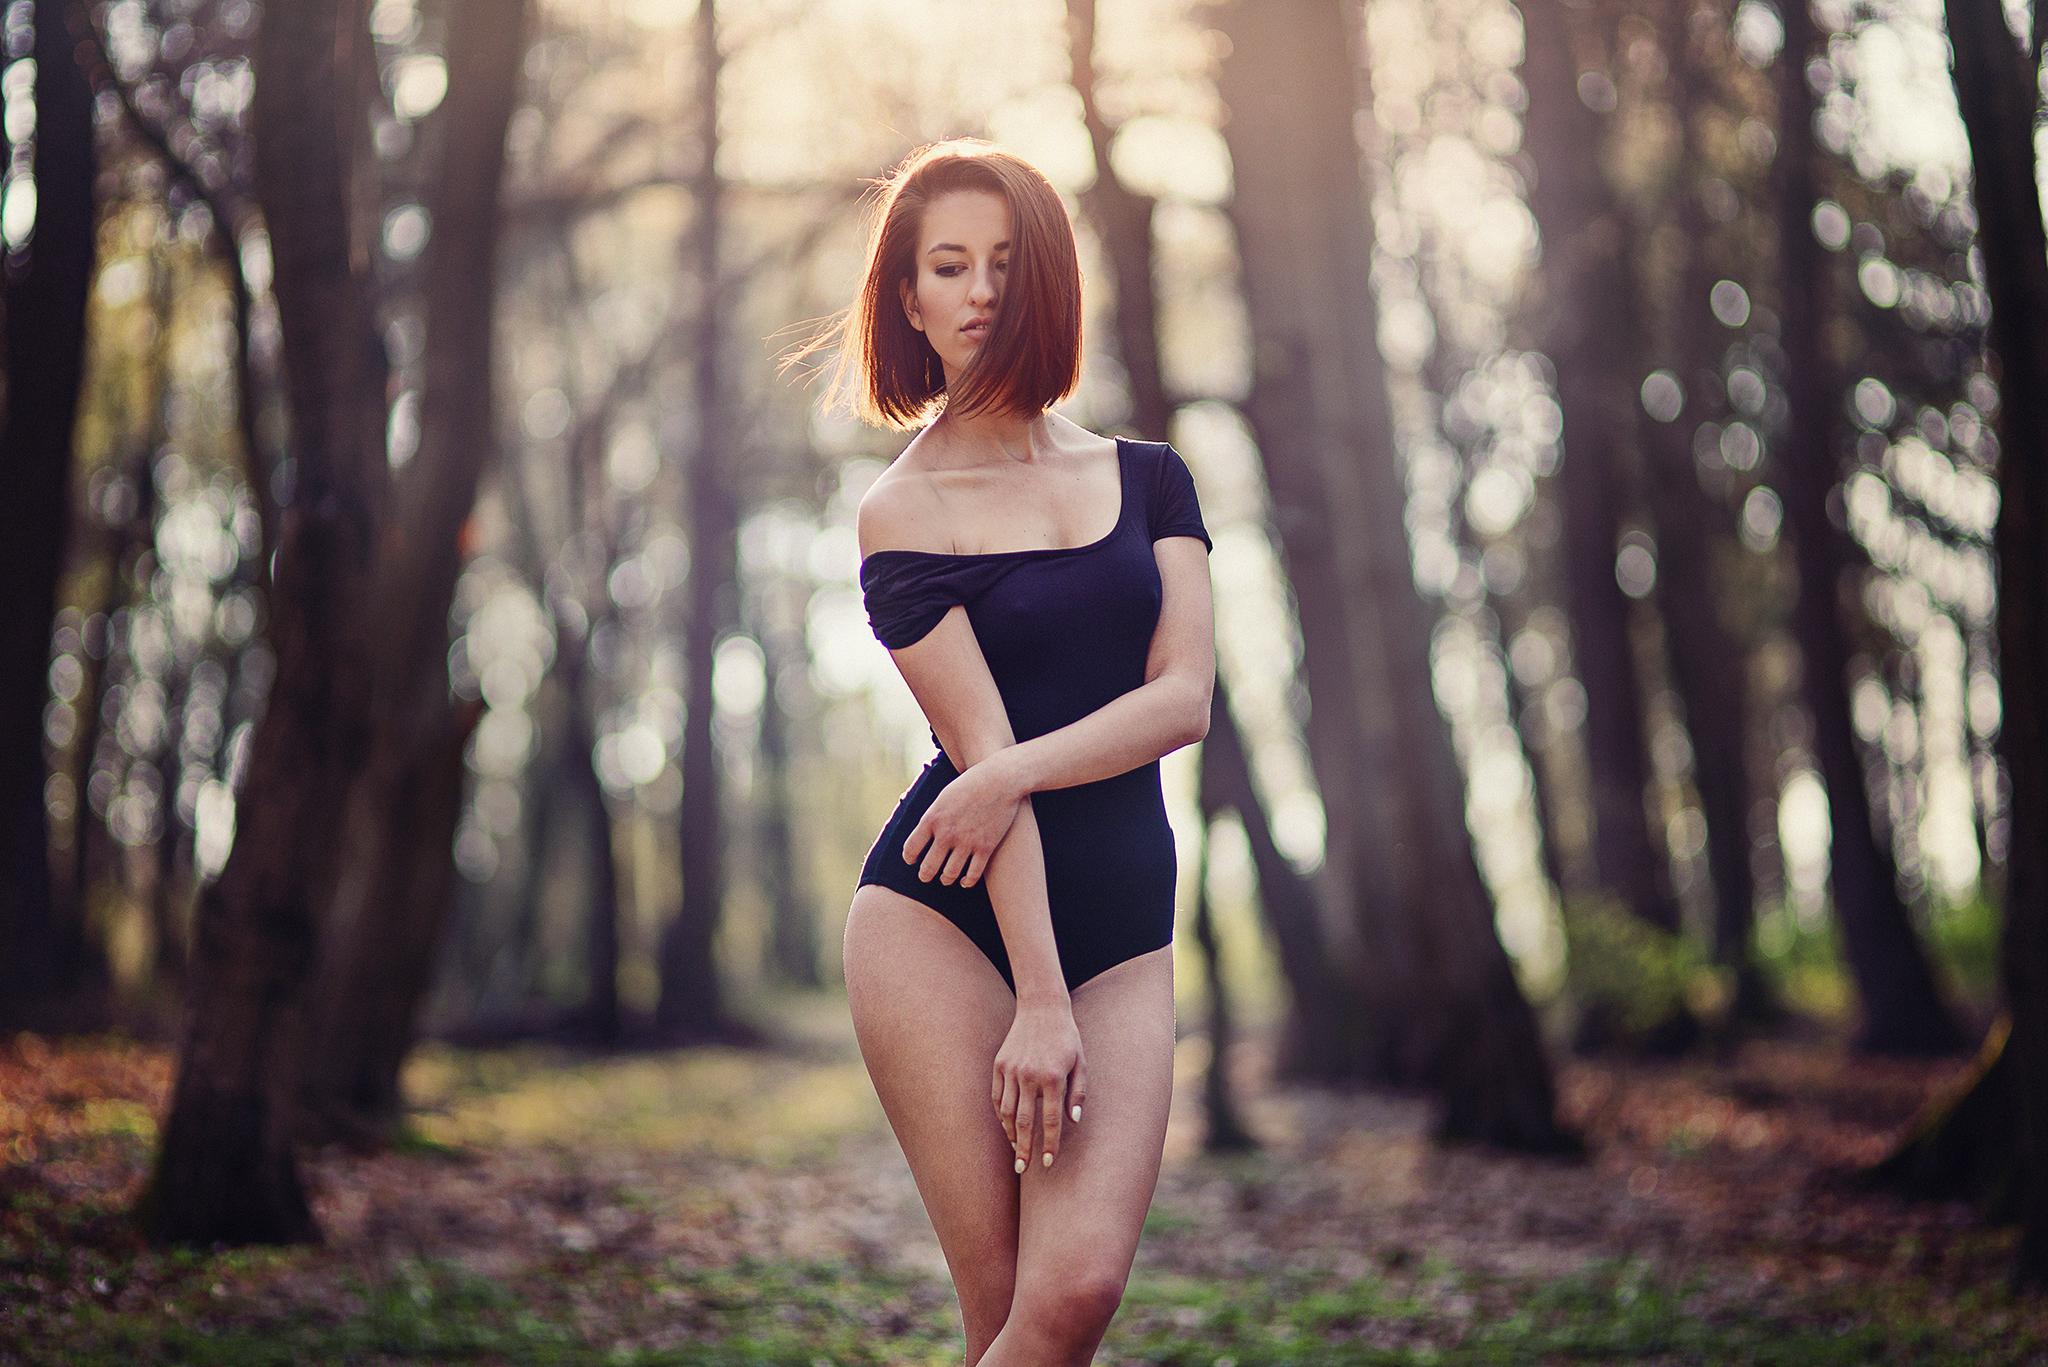 západ slnka, les, vietor, body, glamour, sexy, beauty